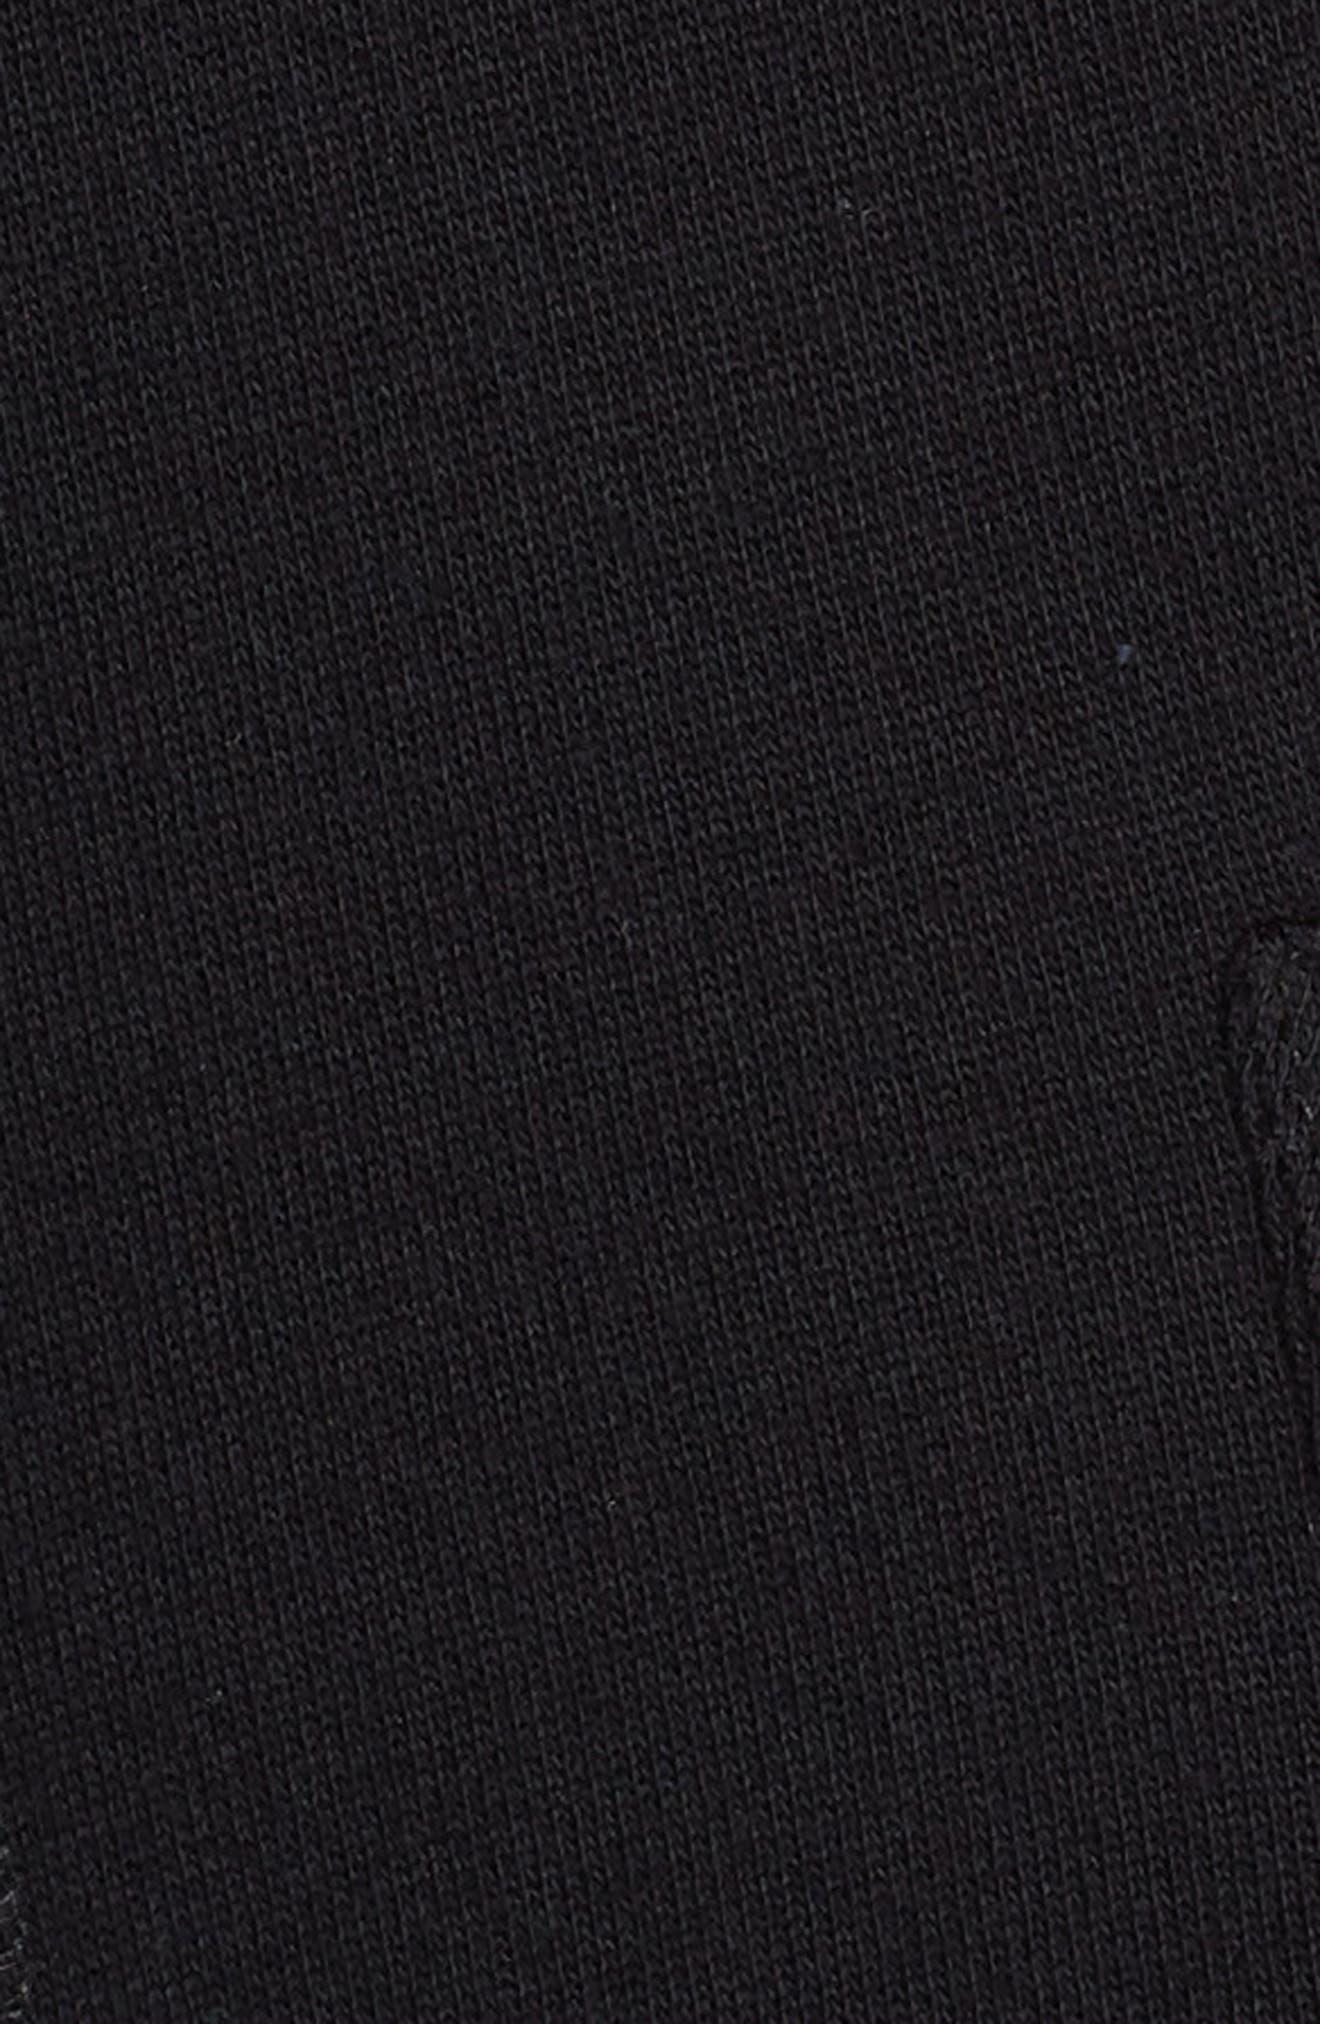 Knit Roll Sleeve Blazer,                             Alternate thumbnail 6, color,                             Black